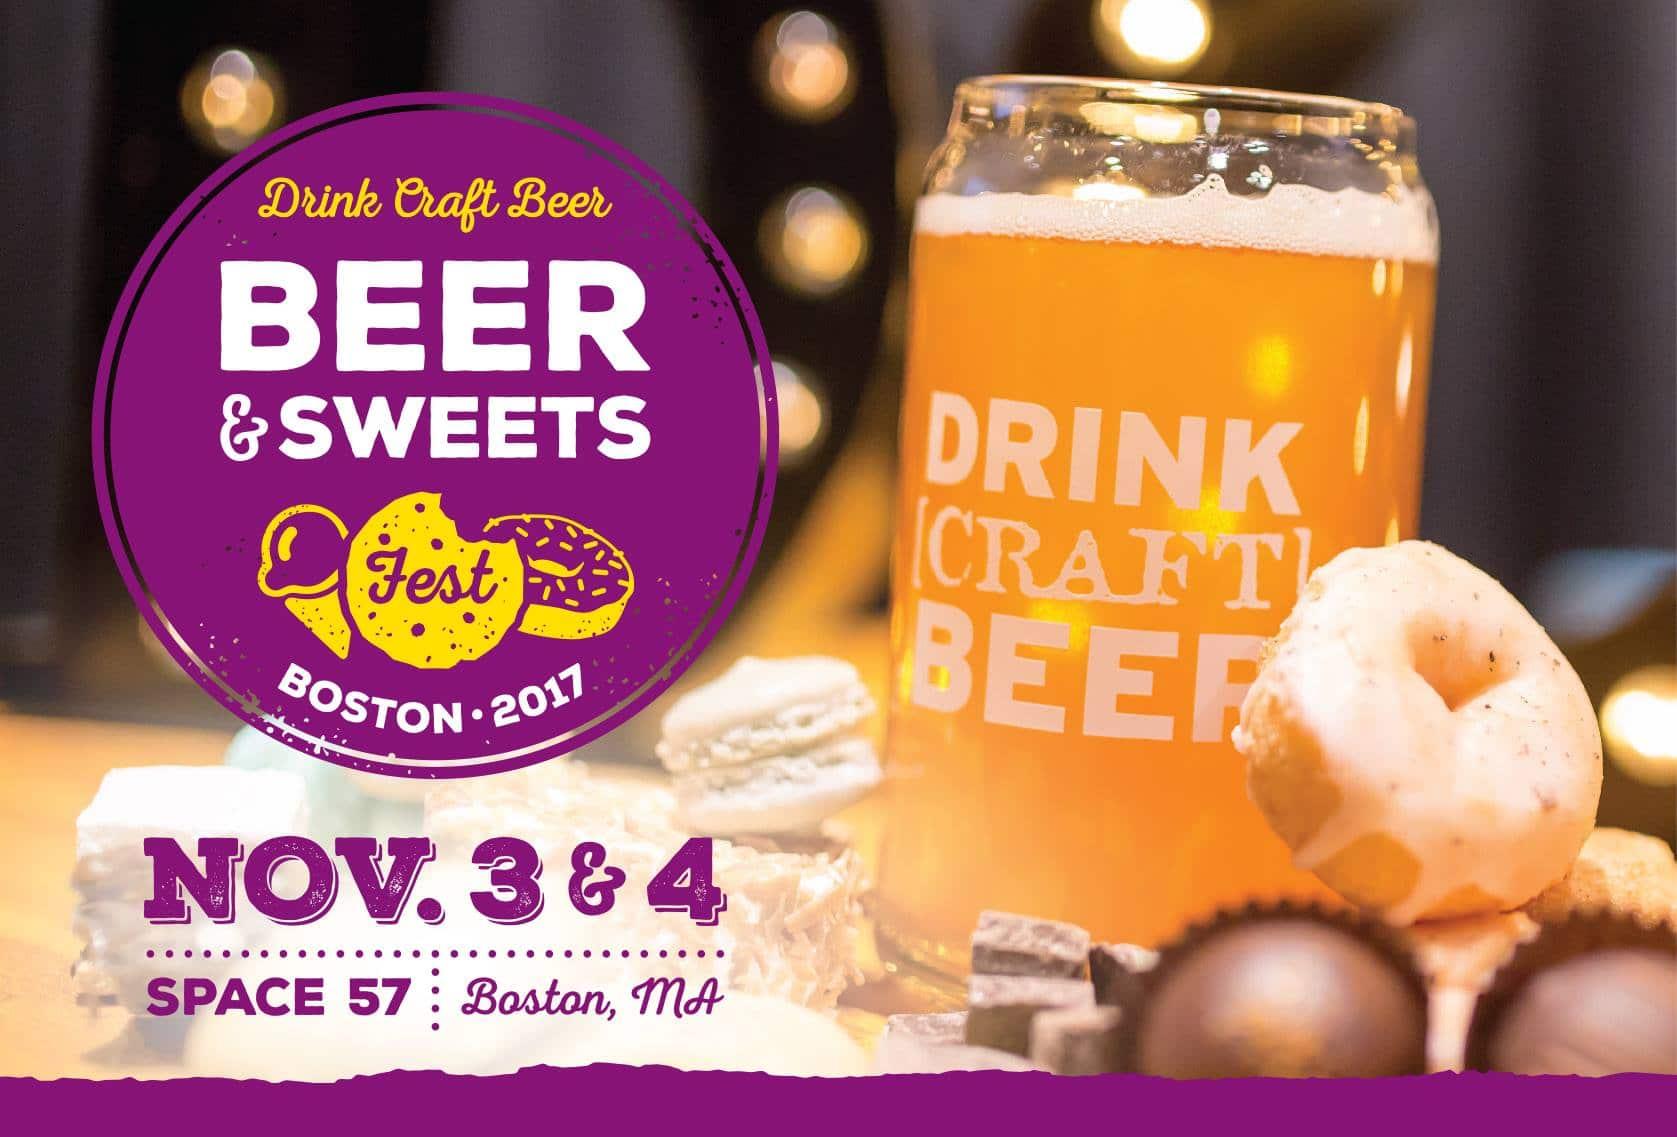 Drink Craft Beer Fest Boston